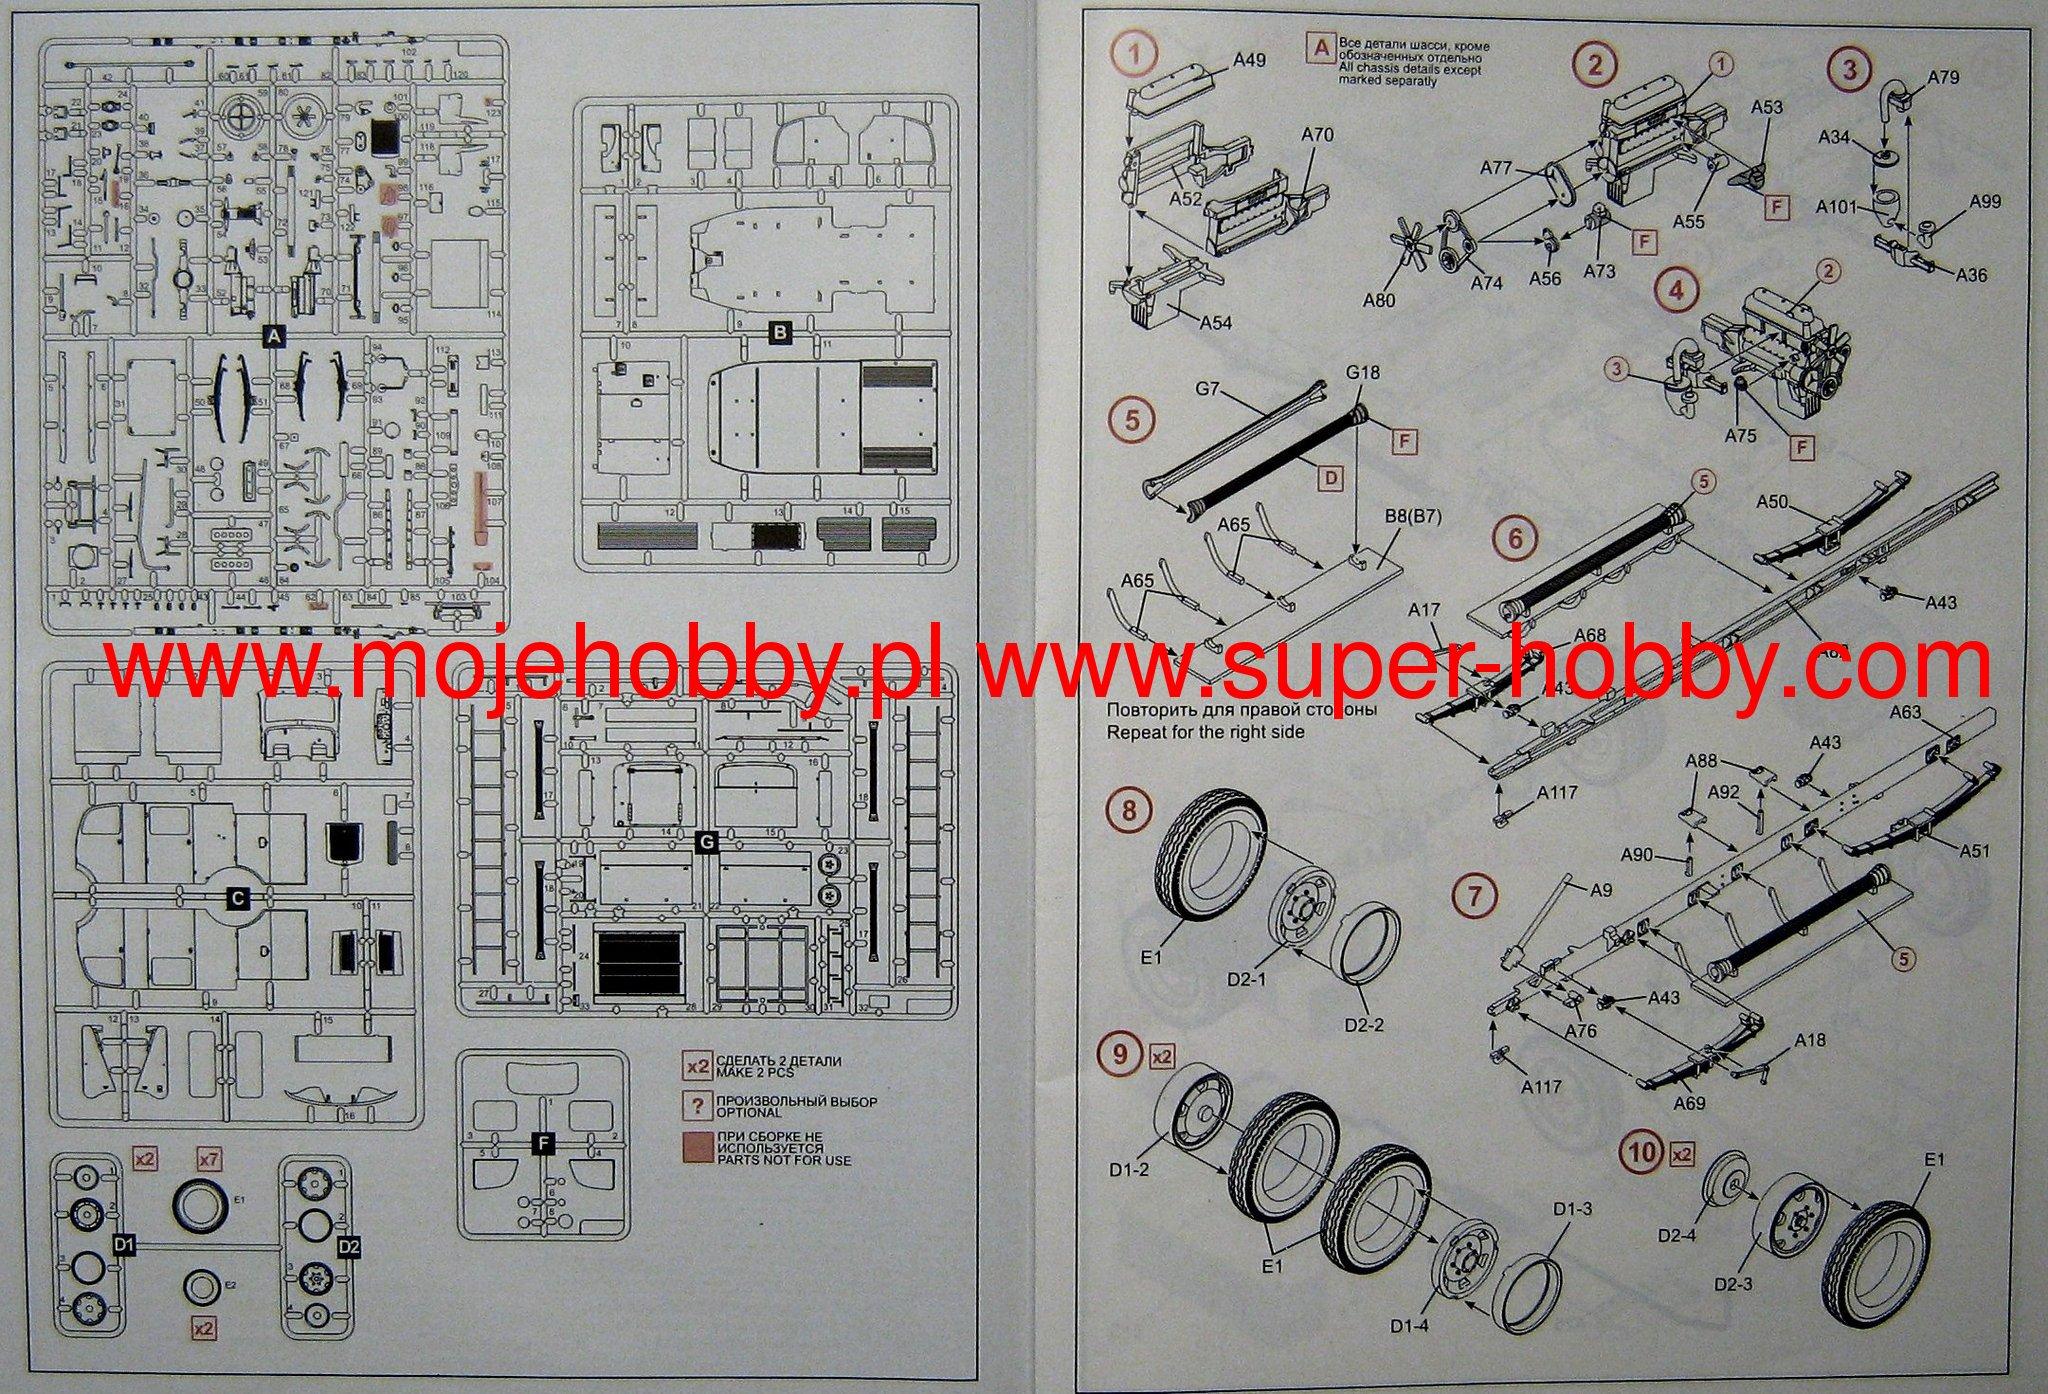 icm literature wiring diagrams wiring diagramicm literature wiring diagrams best wiring libraryicm literature wiring diagrams 12